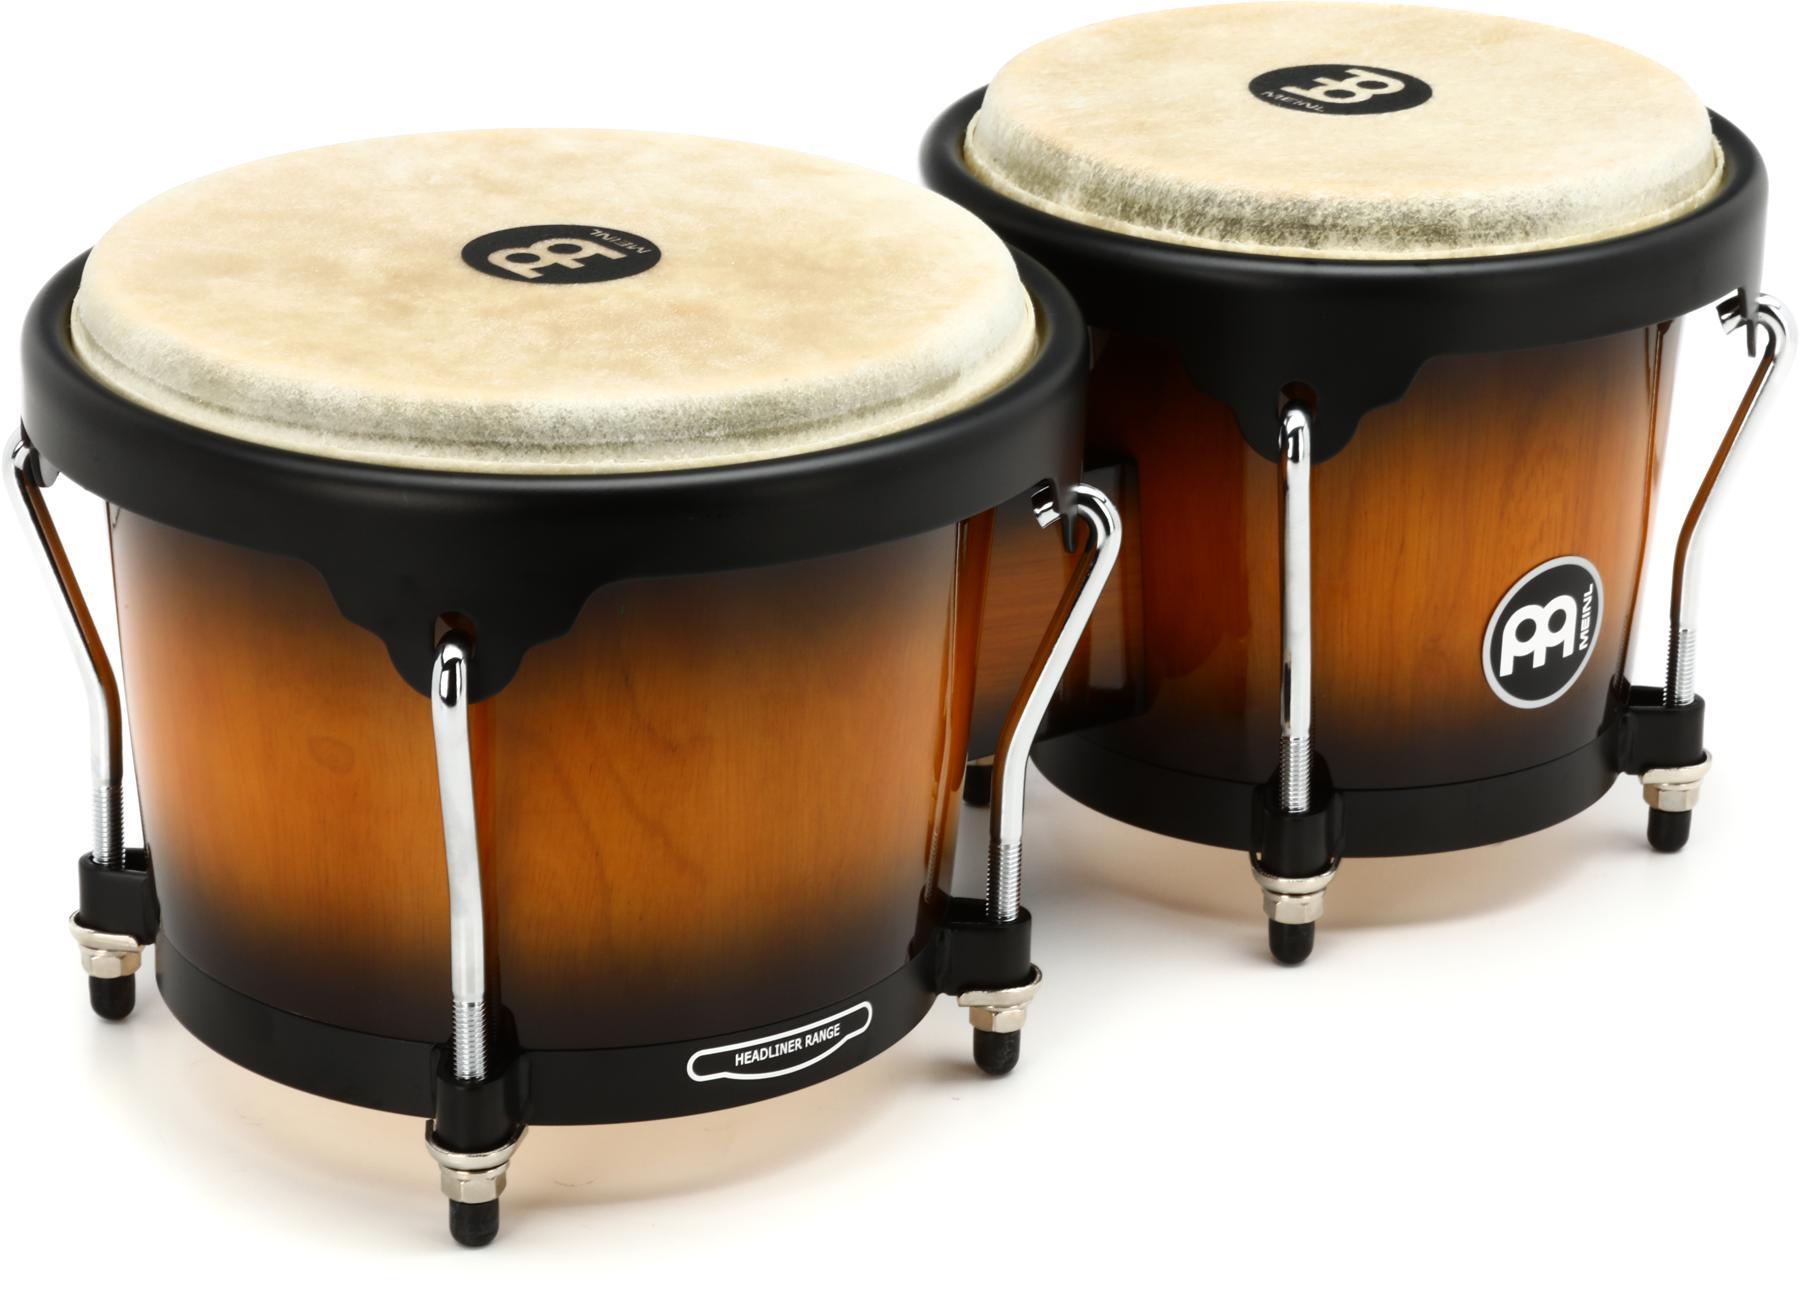 1. Meinl Percussion Bongos With Hardwood Shells